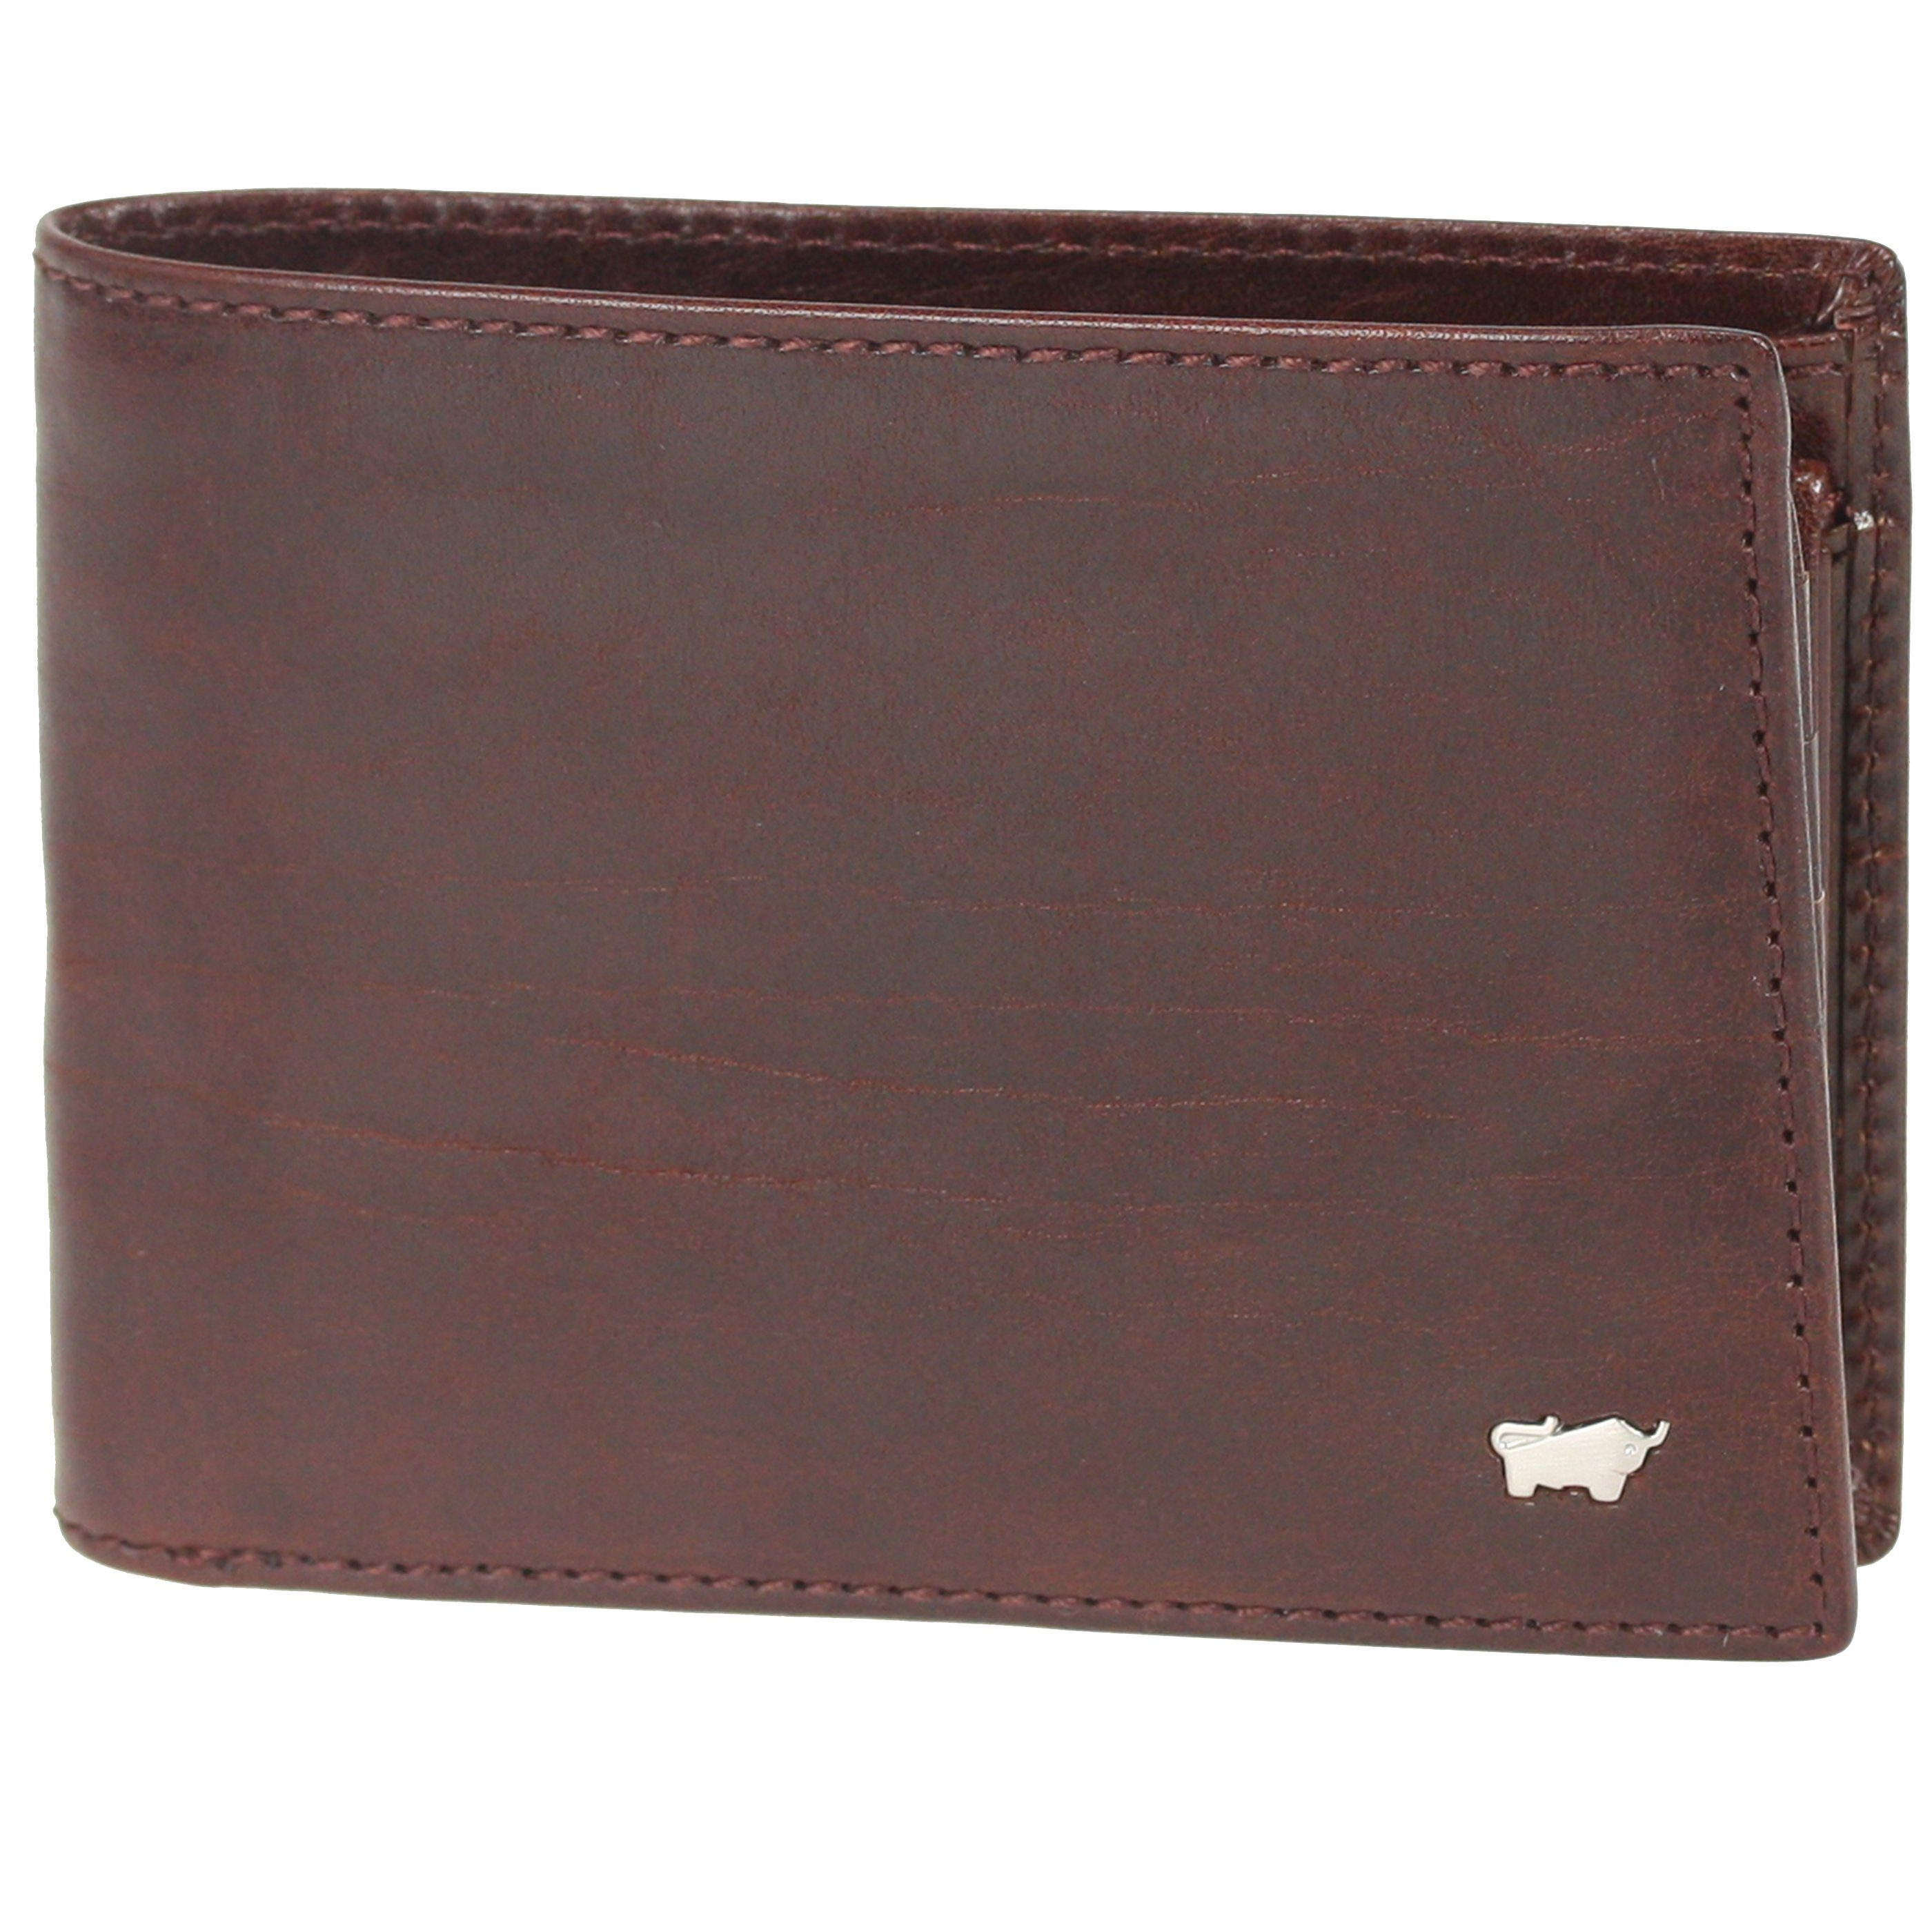 Braun Büffel Basic Geldbörse VII Leder 12,5 cm